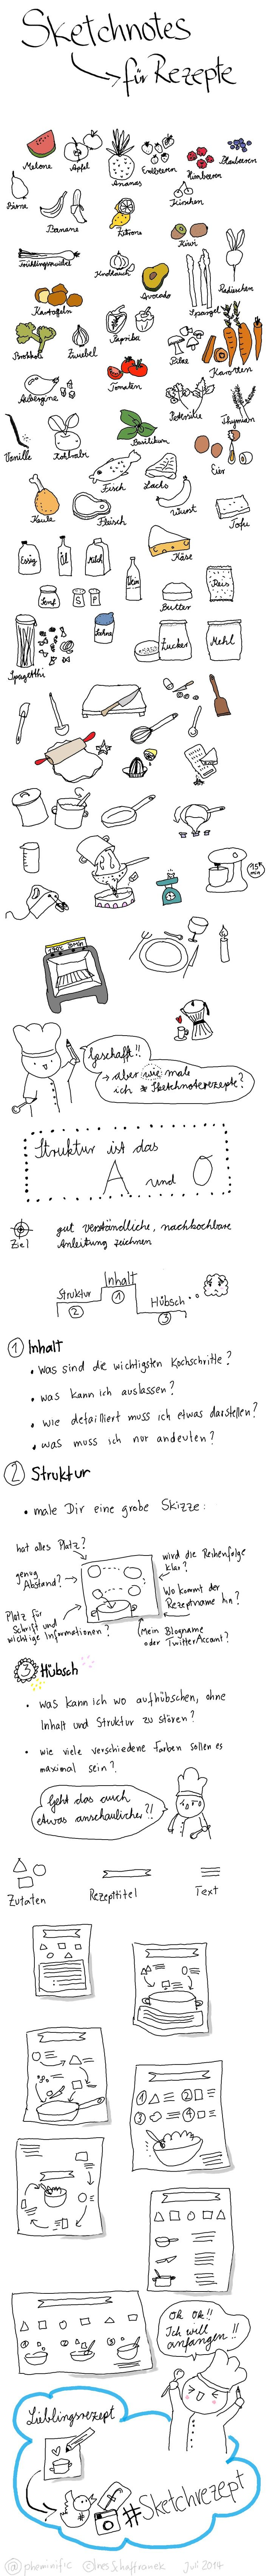 Rezepte visualisieren mit Sketchnotes